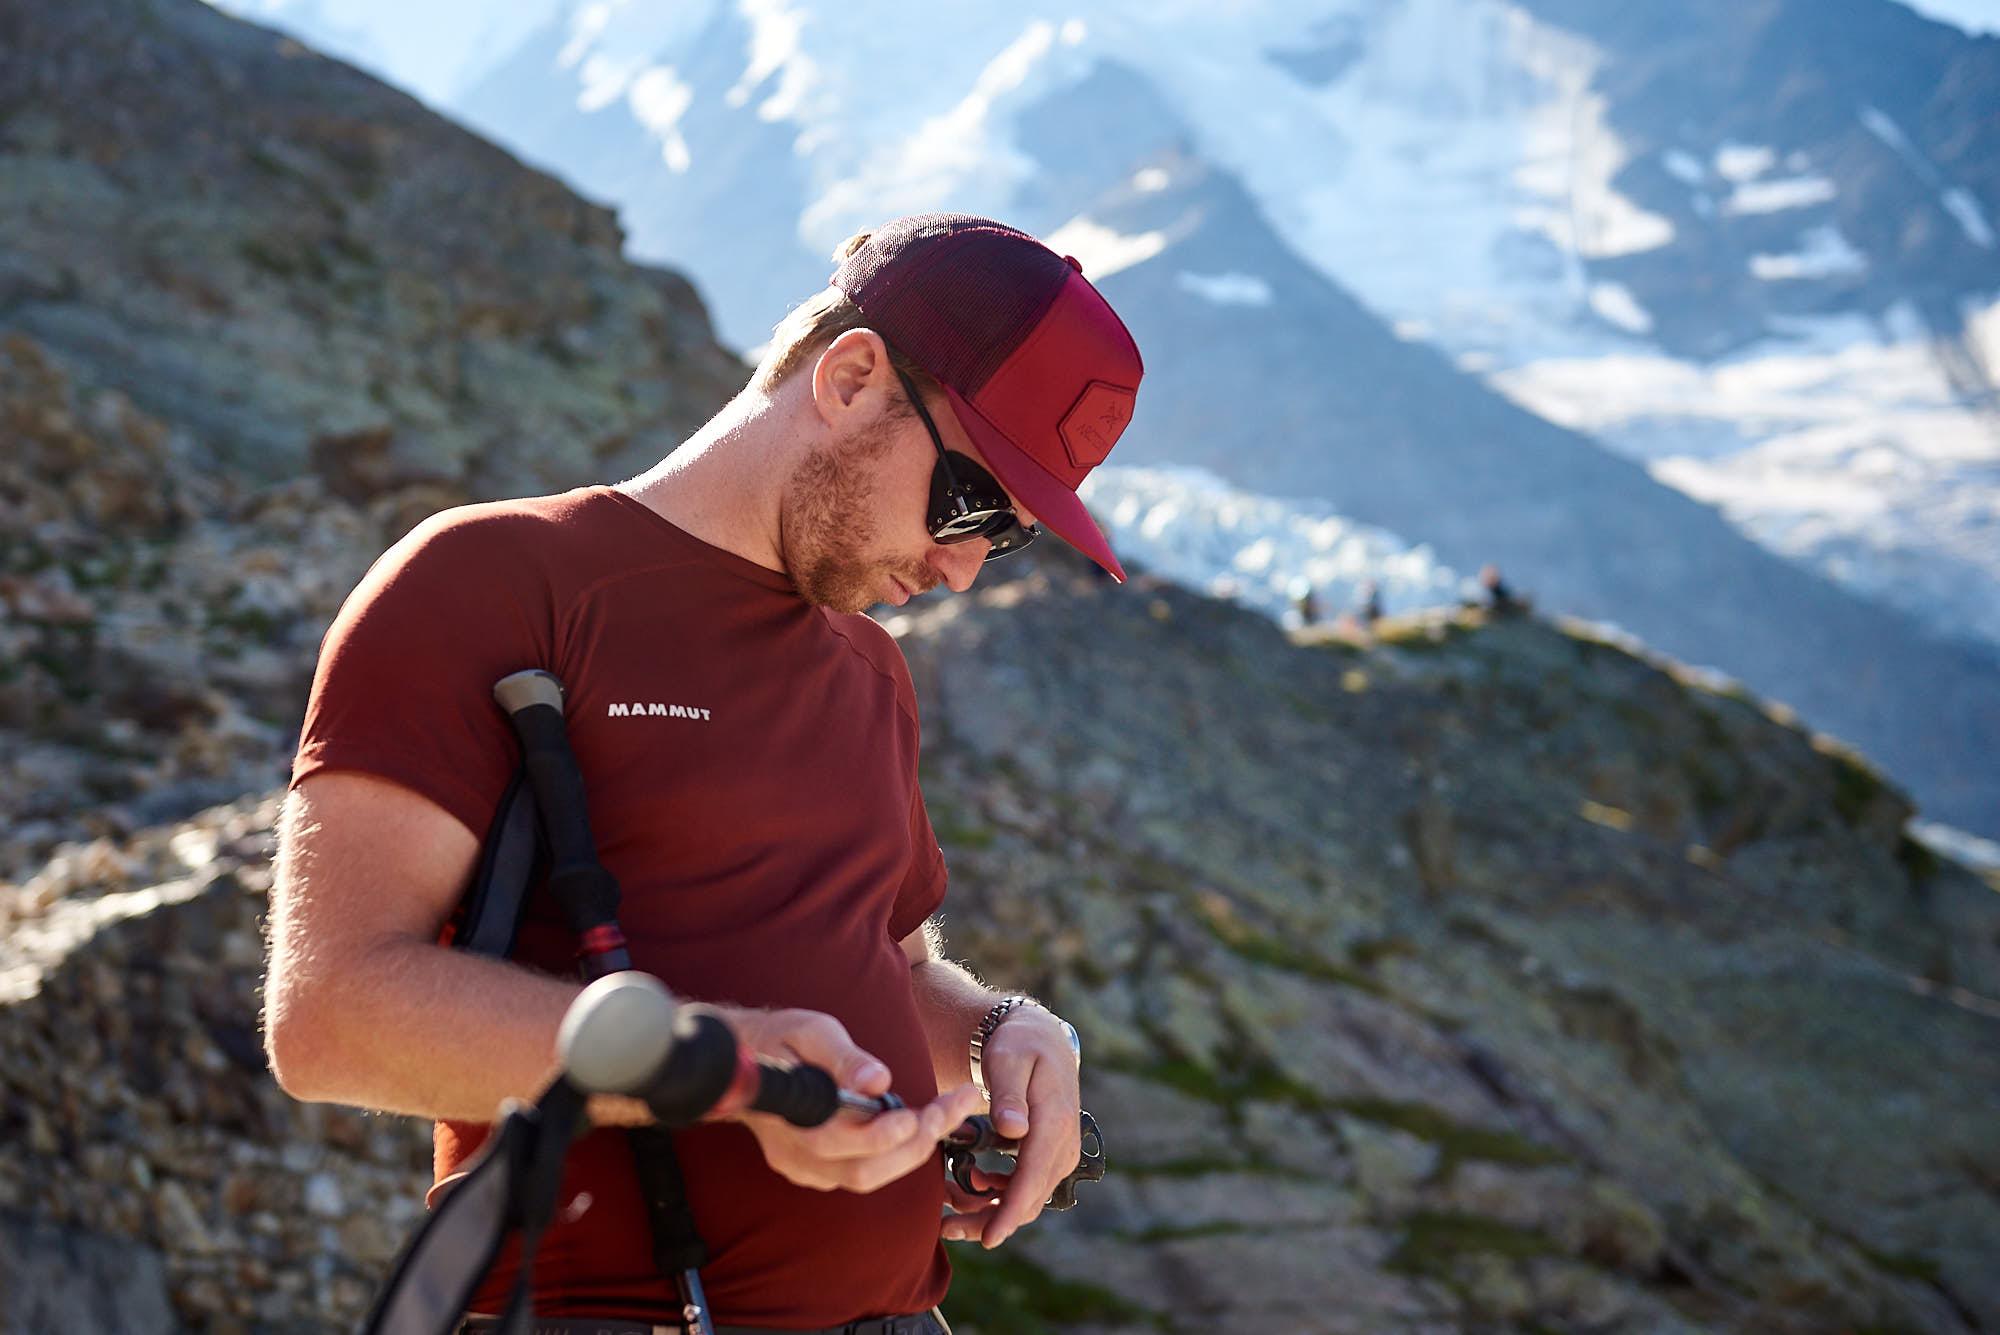 Alpinist preparing gear near Mont Blanc in France